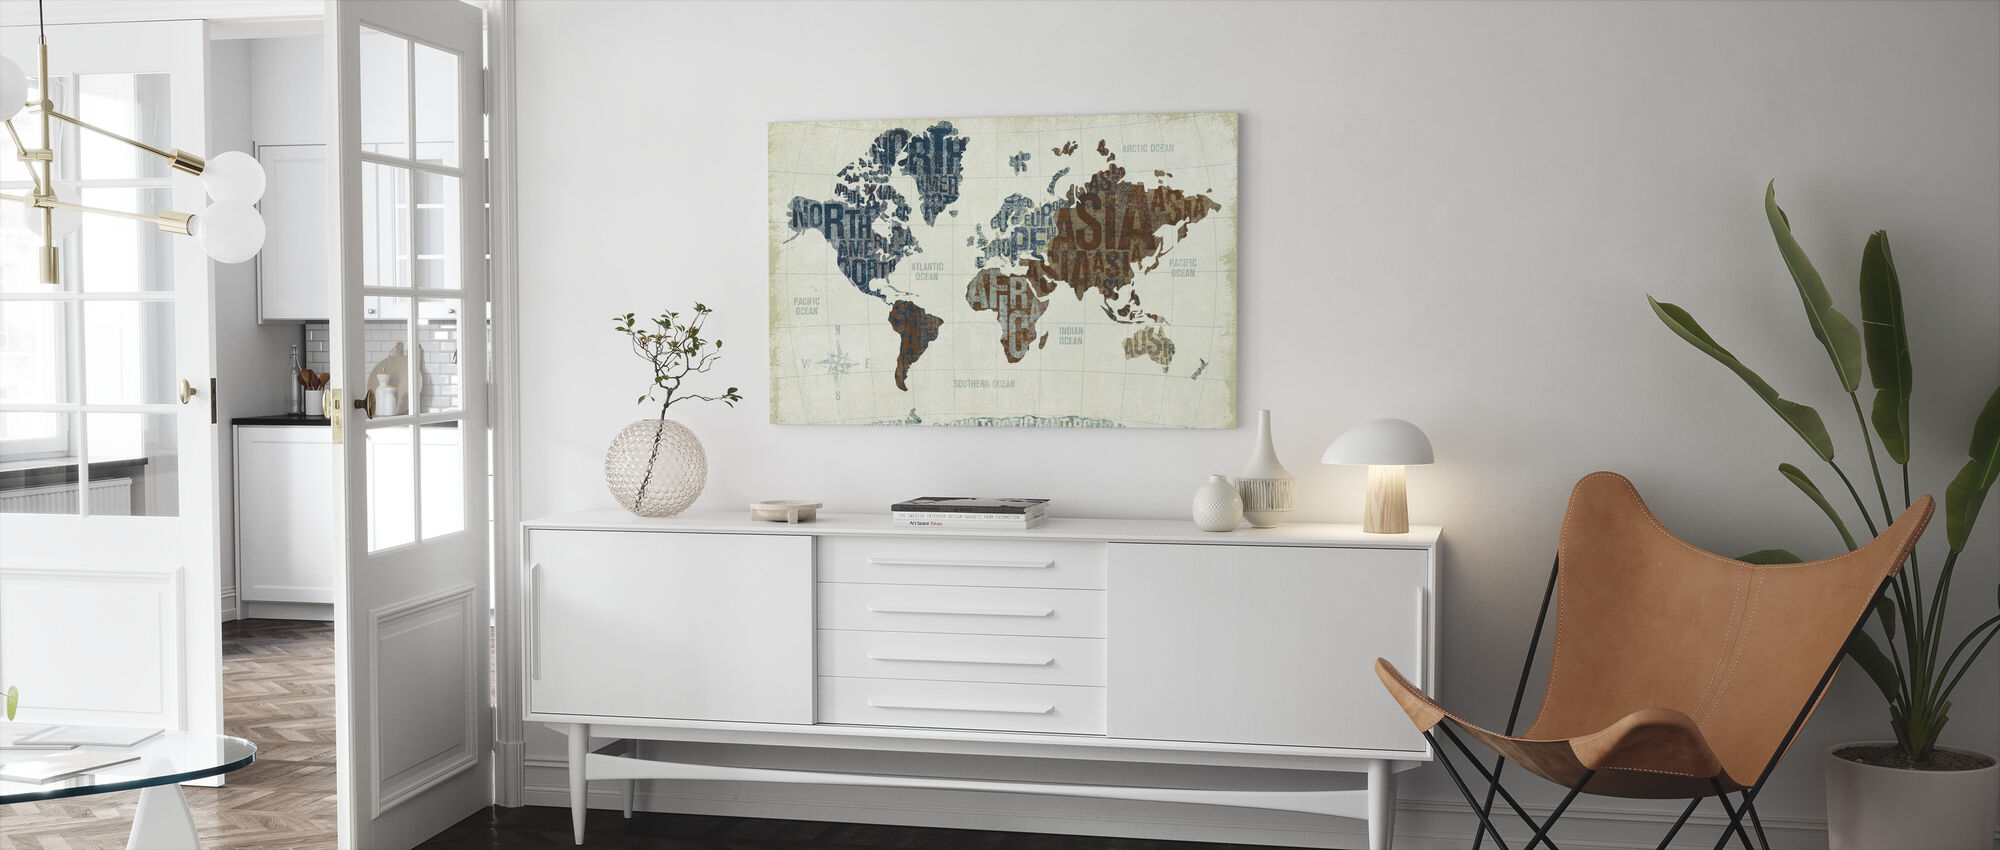 Moderni maailma neutraali - Canvastaulu - Olohuone